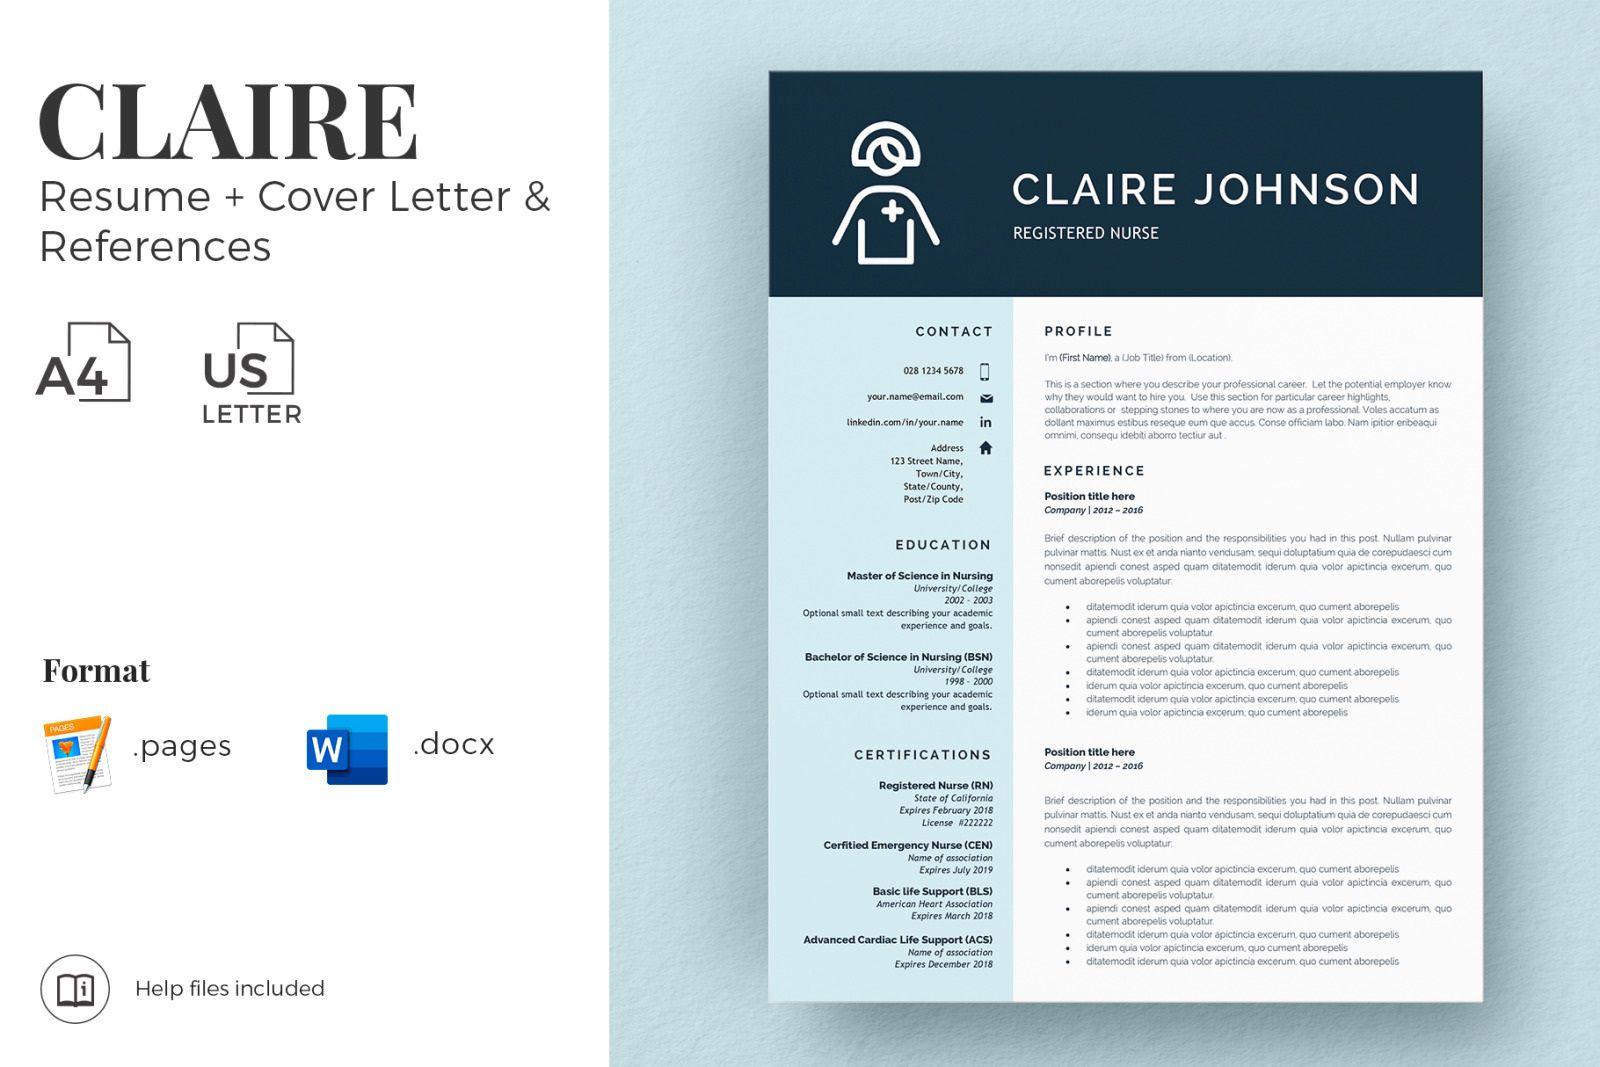 002 Incredible Nurse Resume Template Word High Definition  Cv Free Download RnFull